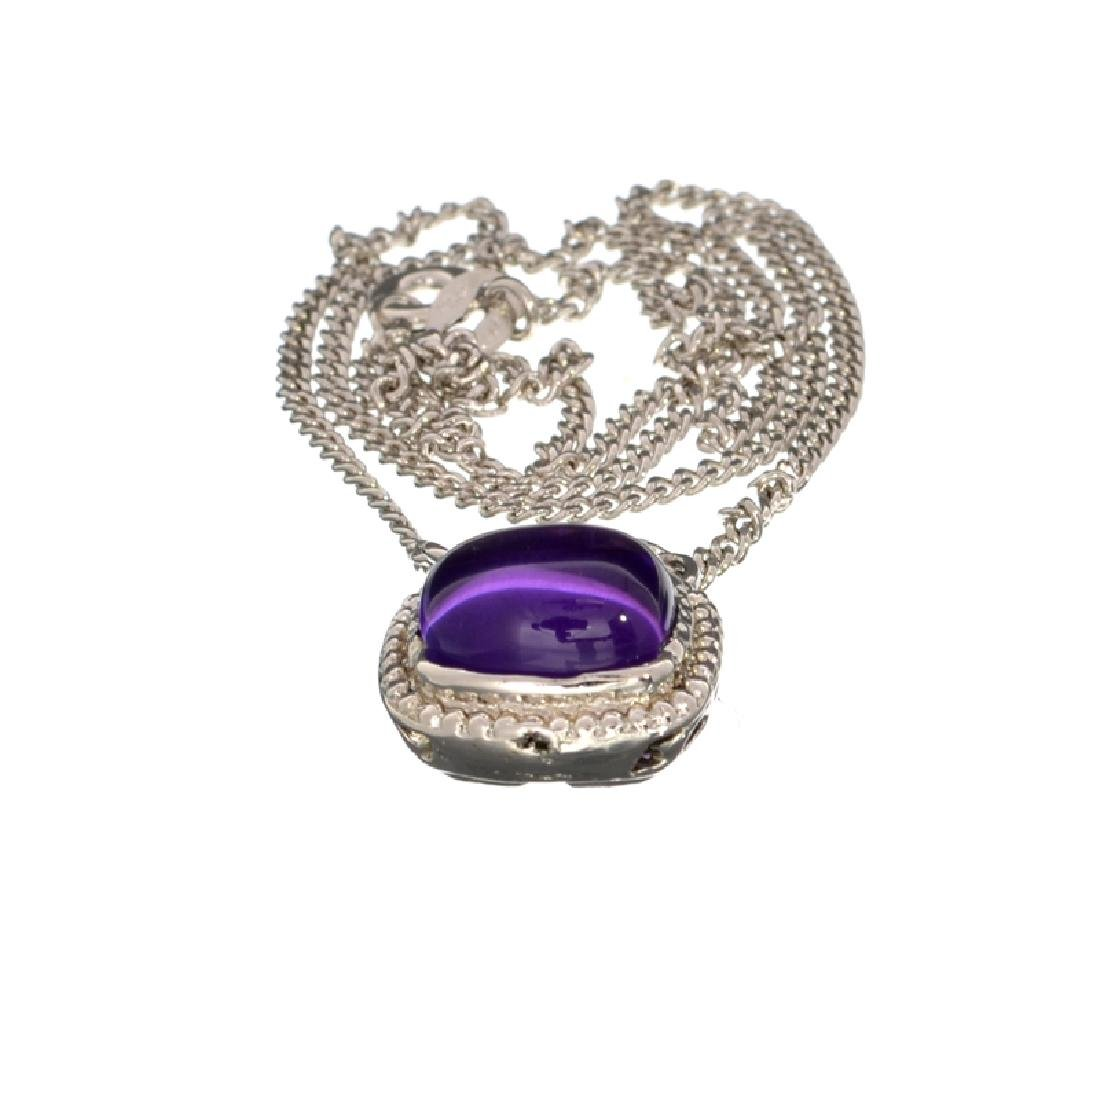 APP: 0.6k Fine Jewelry 3.91CT Cabochon Cut Purple